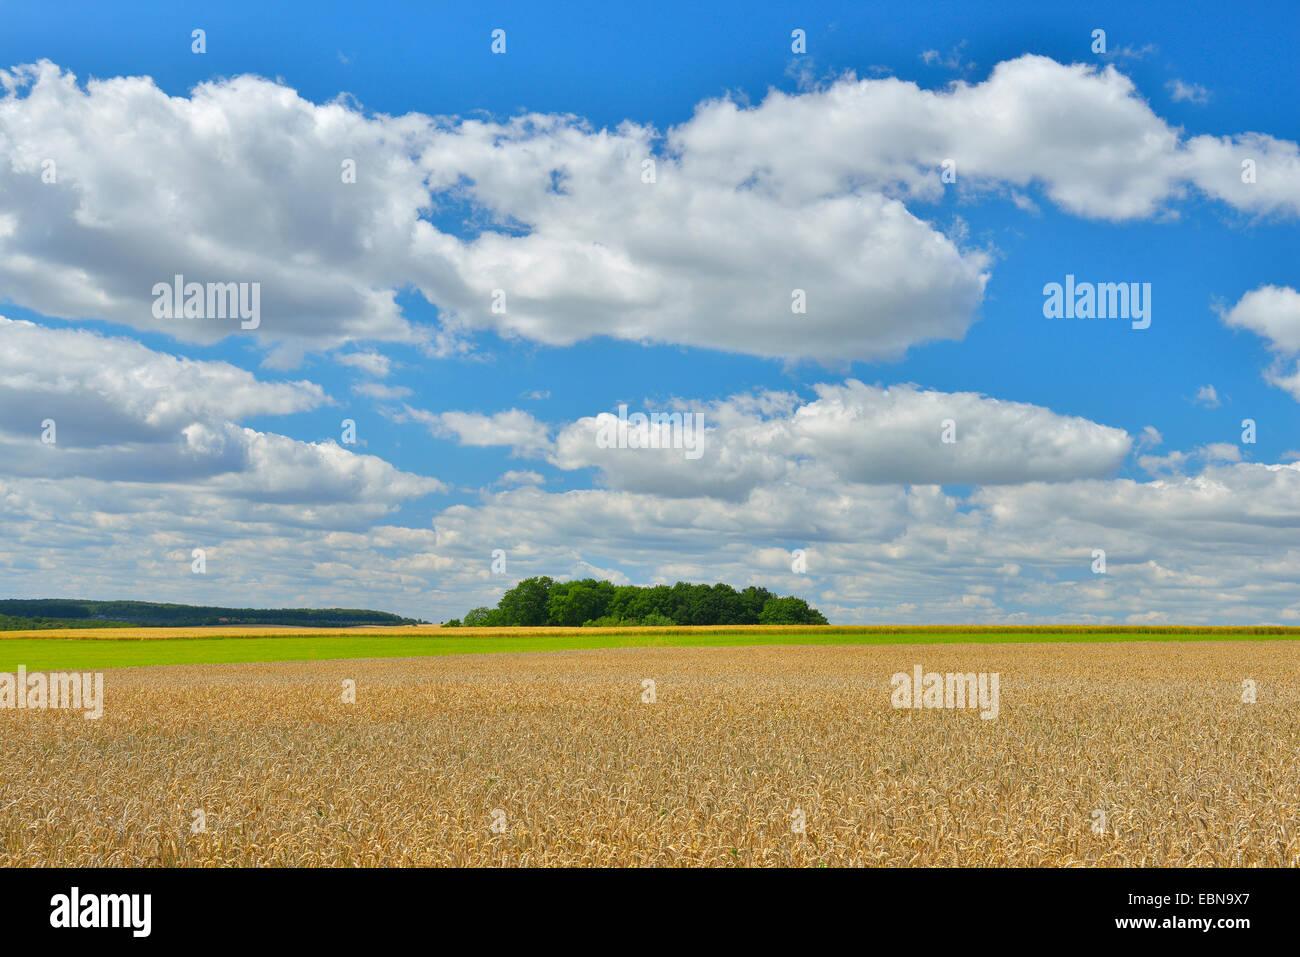 wheat field  in the summer, Germany, Bavaria, Franken, Franconia, Arnstein - Stock Image